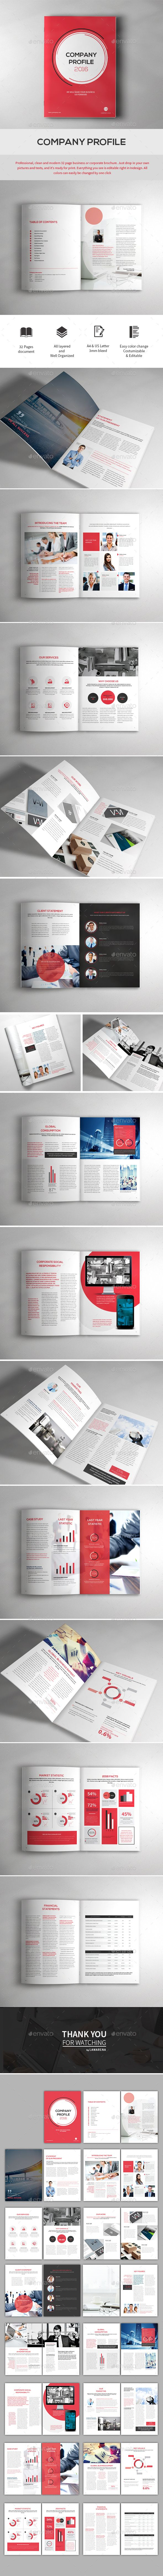 Company Profile | Pinterest | Company profile, Indesign templates ...